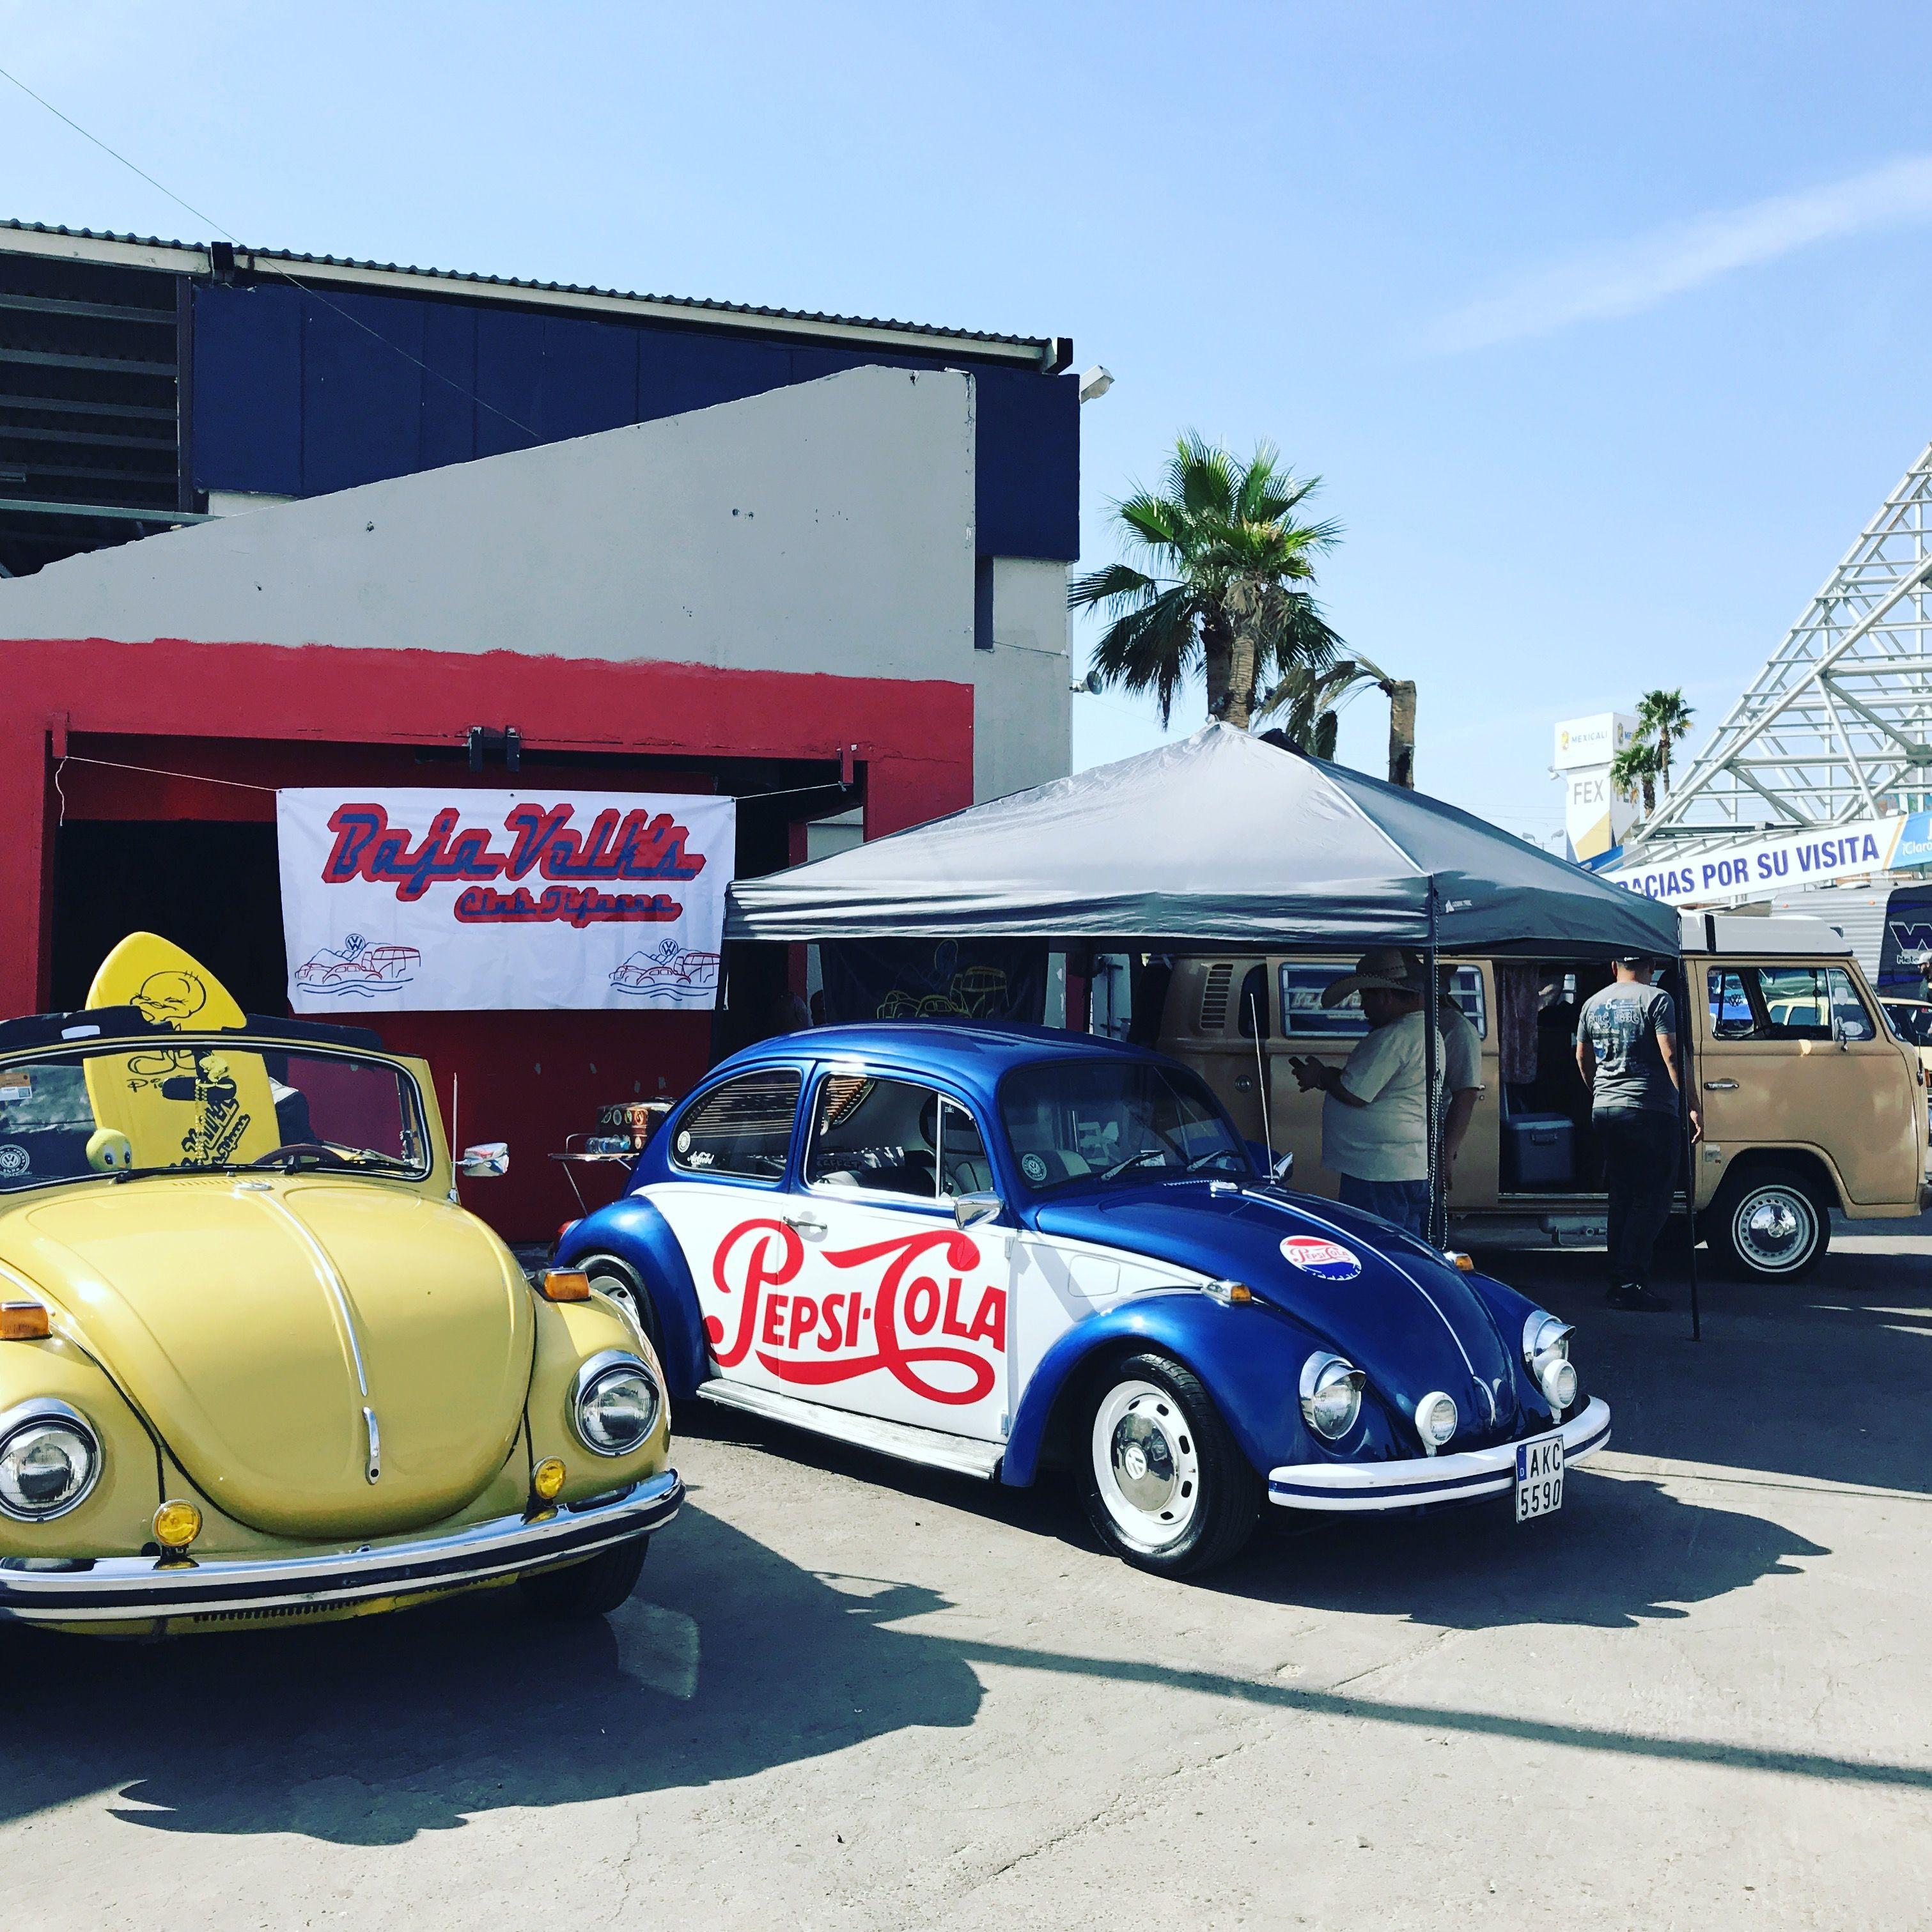 s beetle ride pin c craigslist vw super sweet pinterest convertible and beetles volkswagen shelia b